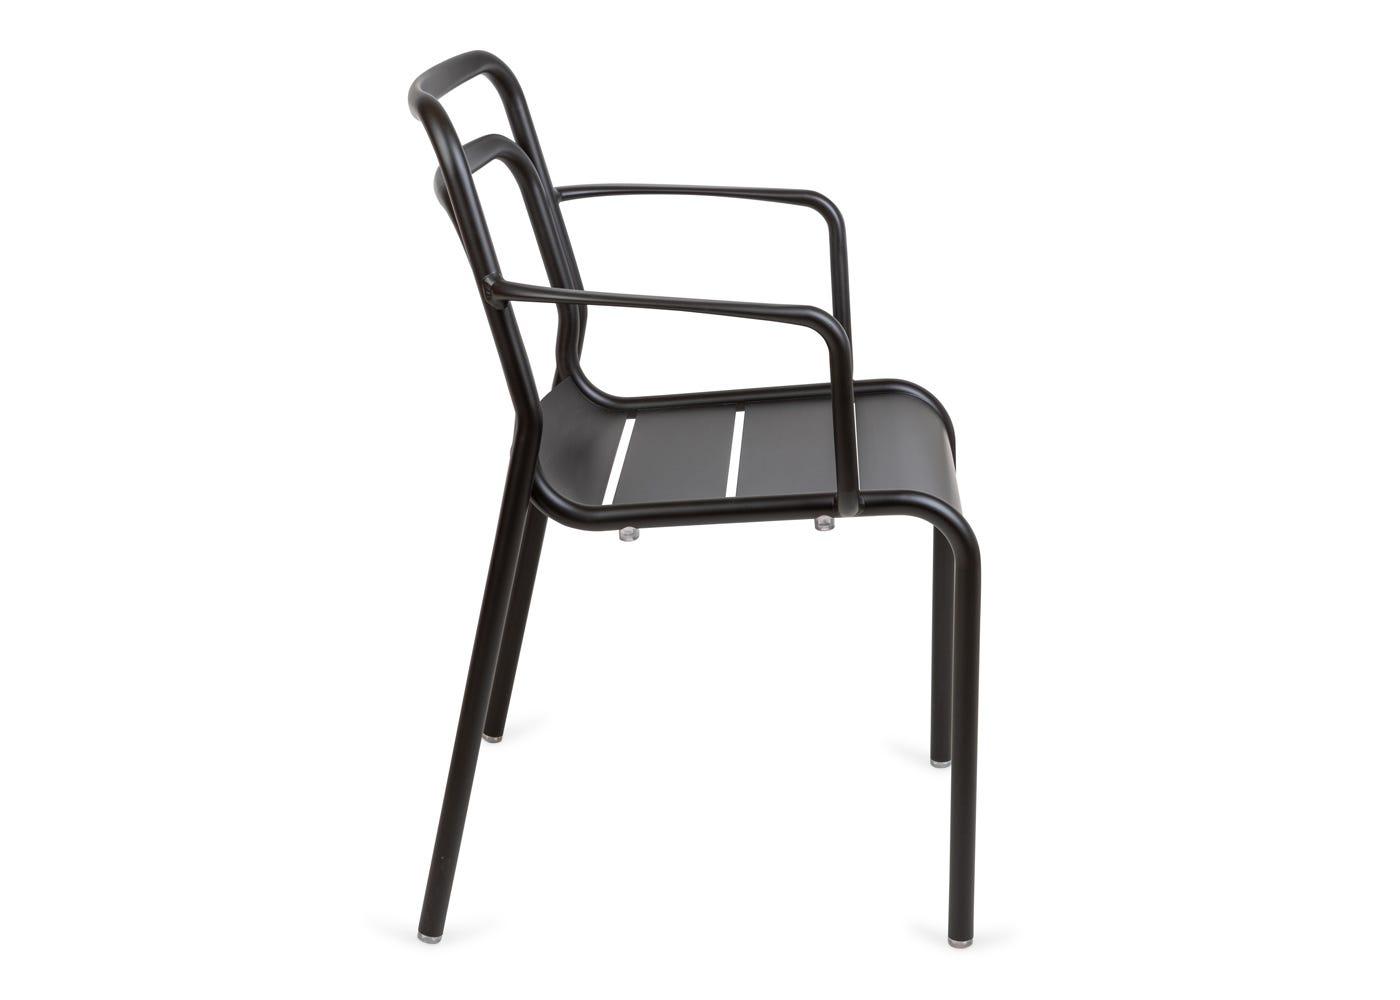 As shown: Petra outdoor armchair in dark grey - Side profile.